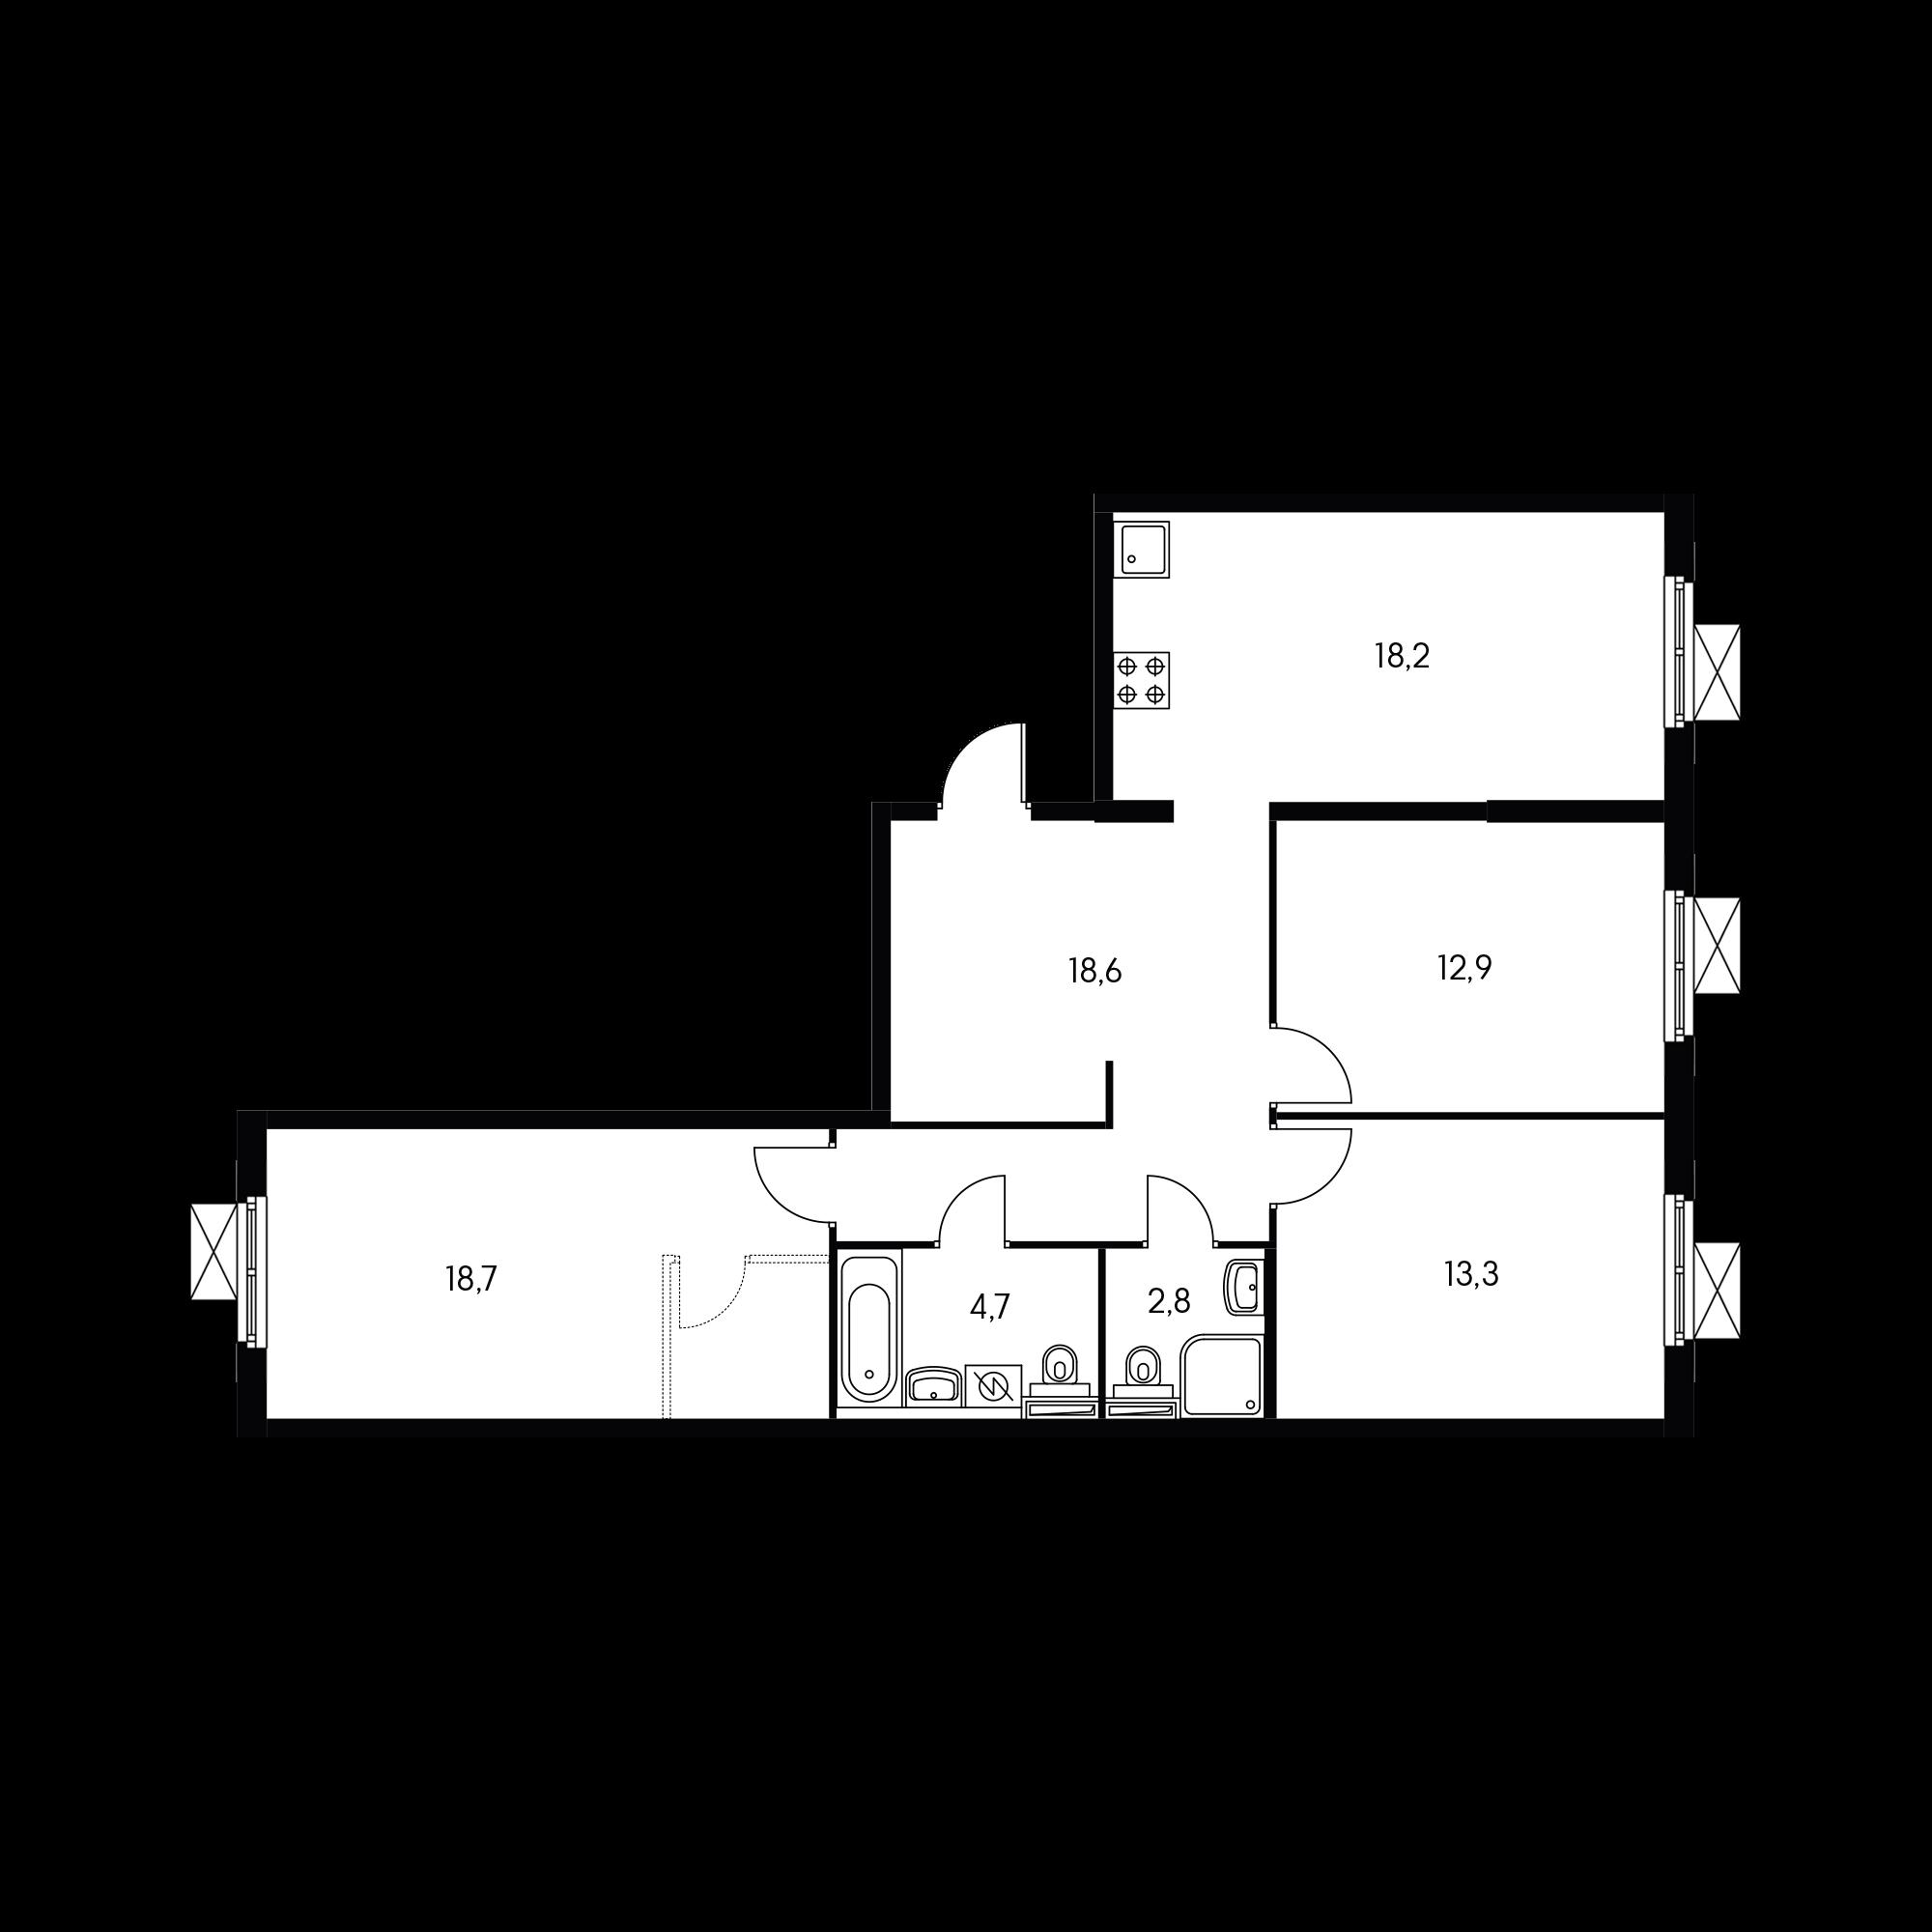 3EL3_9.9-2